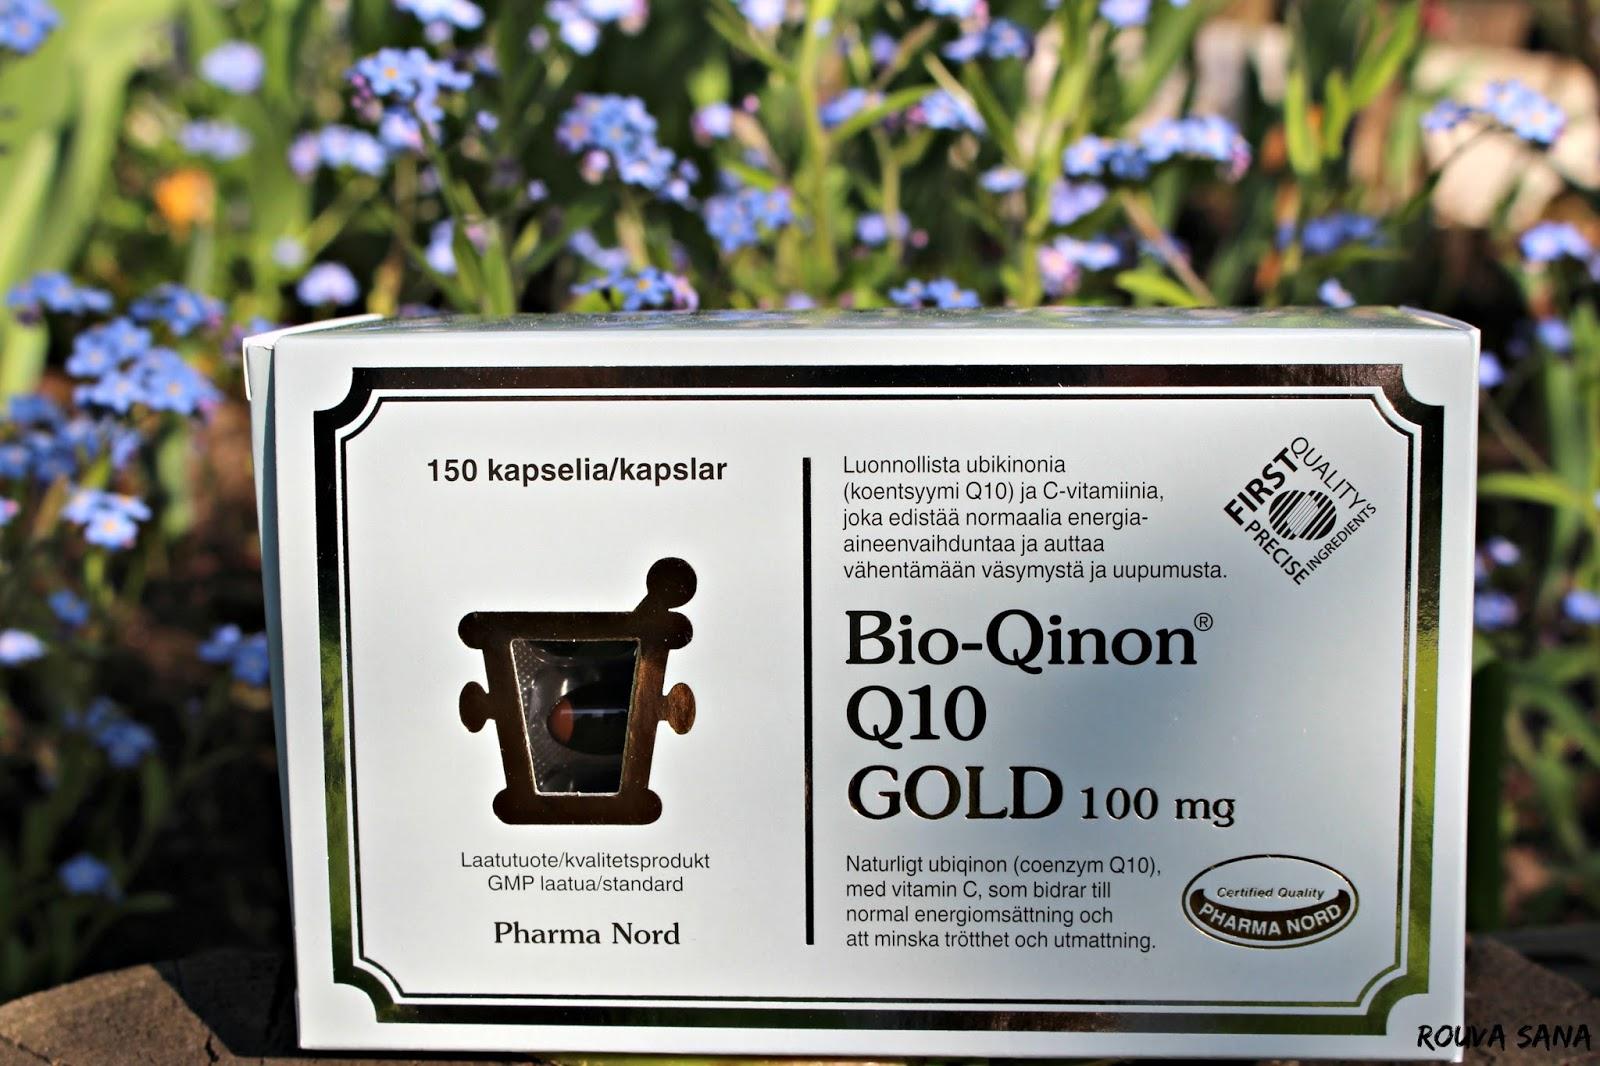 Pharma Nord, Migreeni, Bio-Qinon Q10, Rouva Sana, ubikinoni